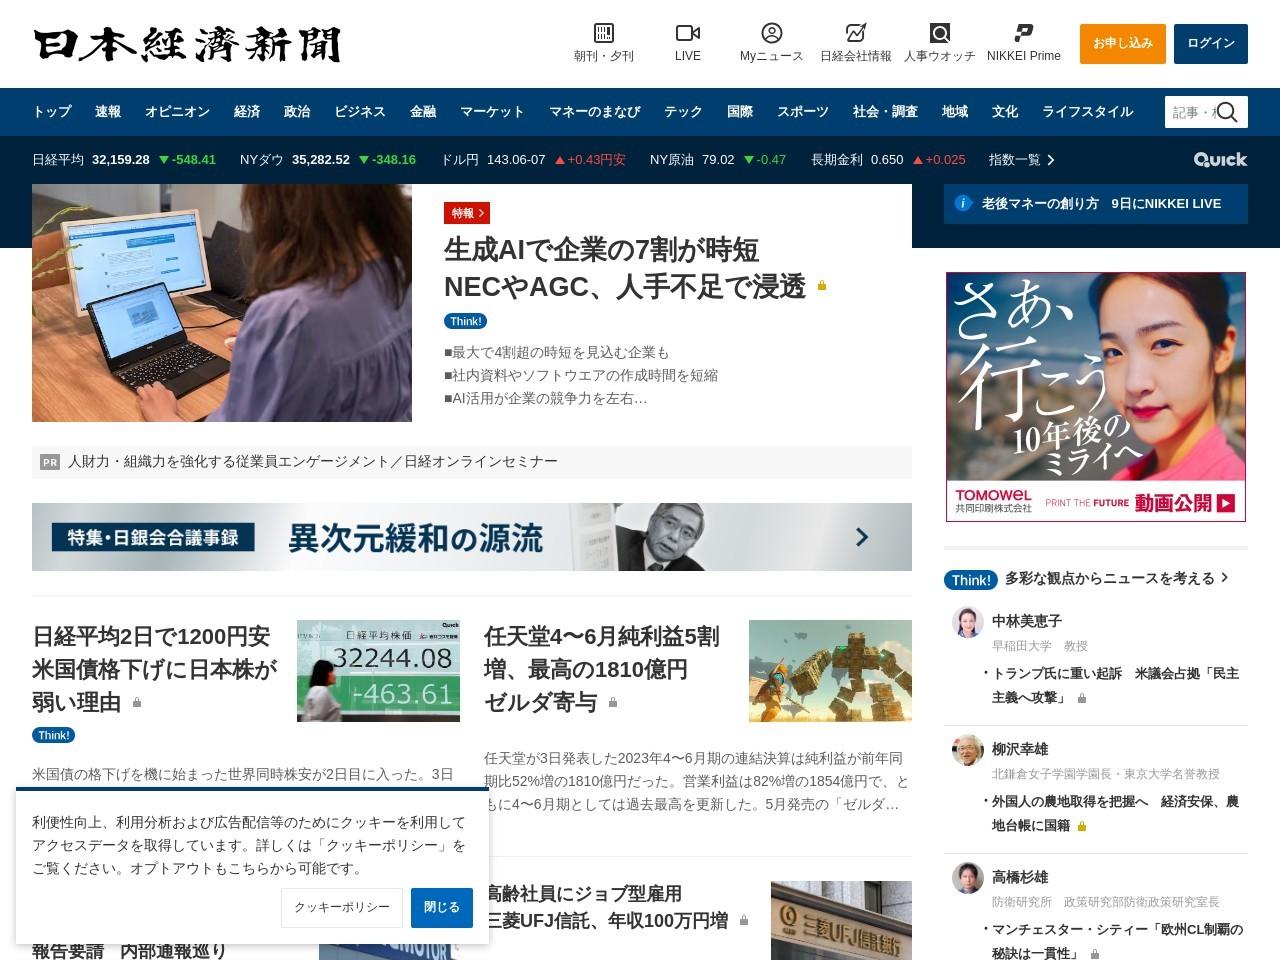 http://www.nikkei.com/article/DGXLAS0040009_Z10C17A3000000/